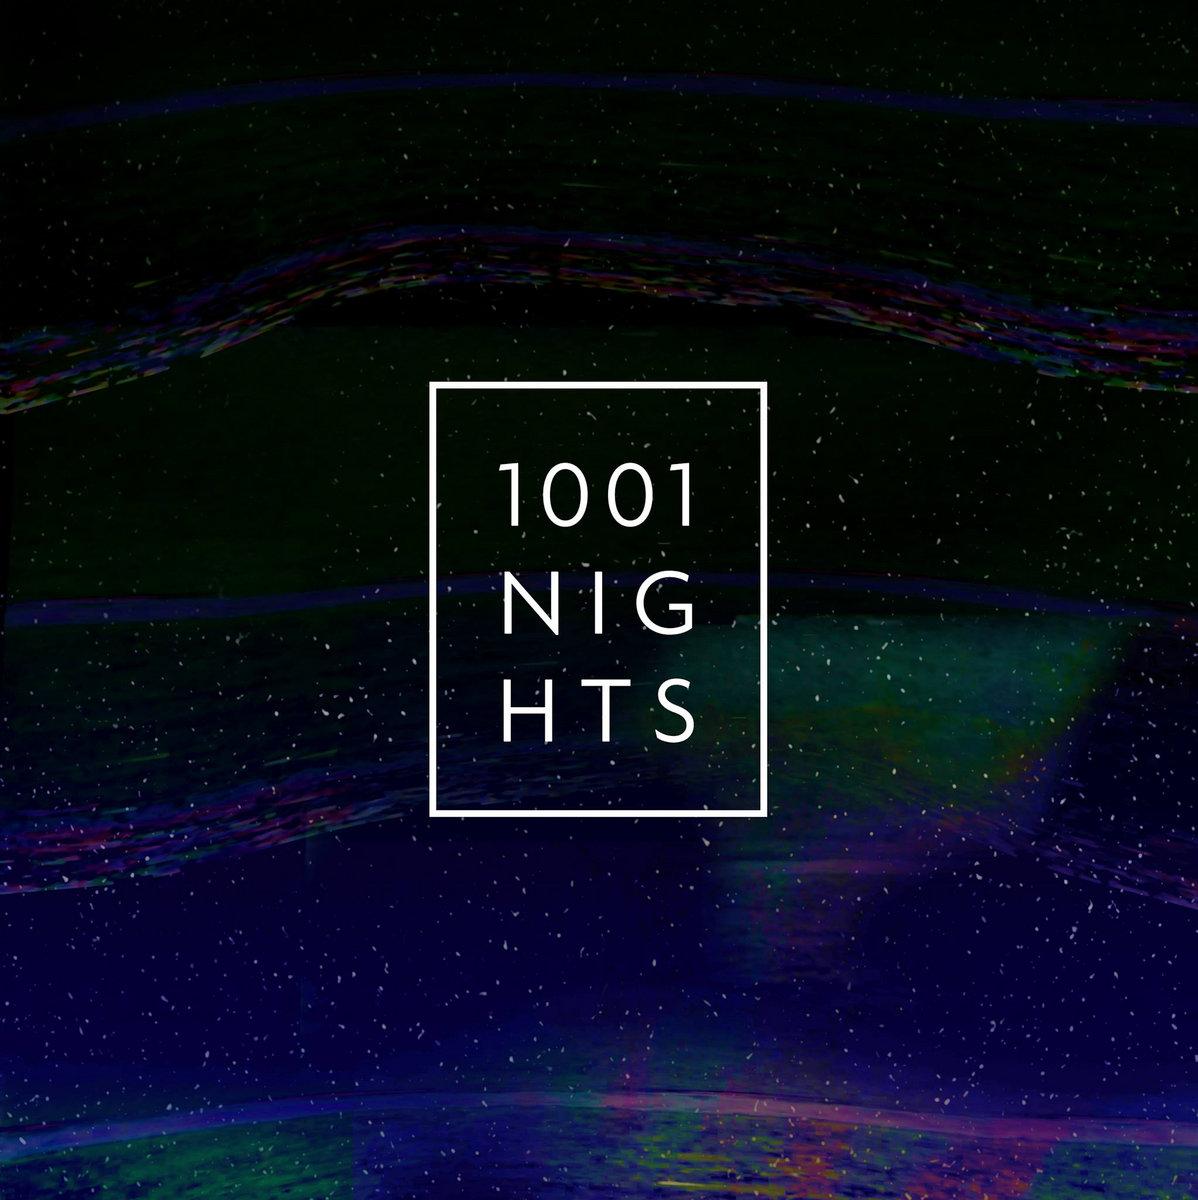 1001 albums torrent download